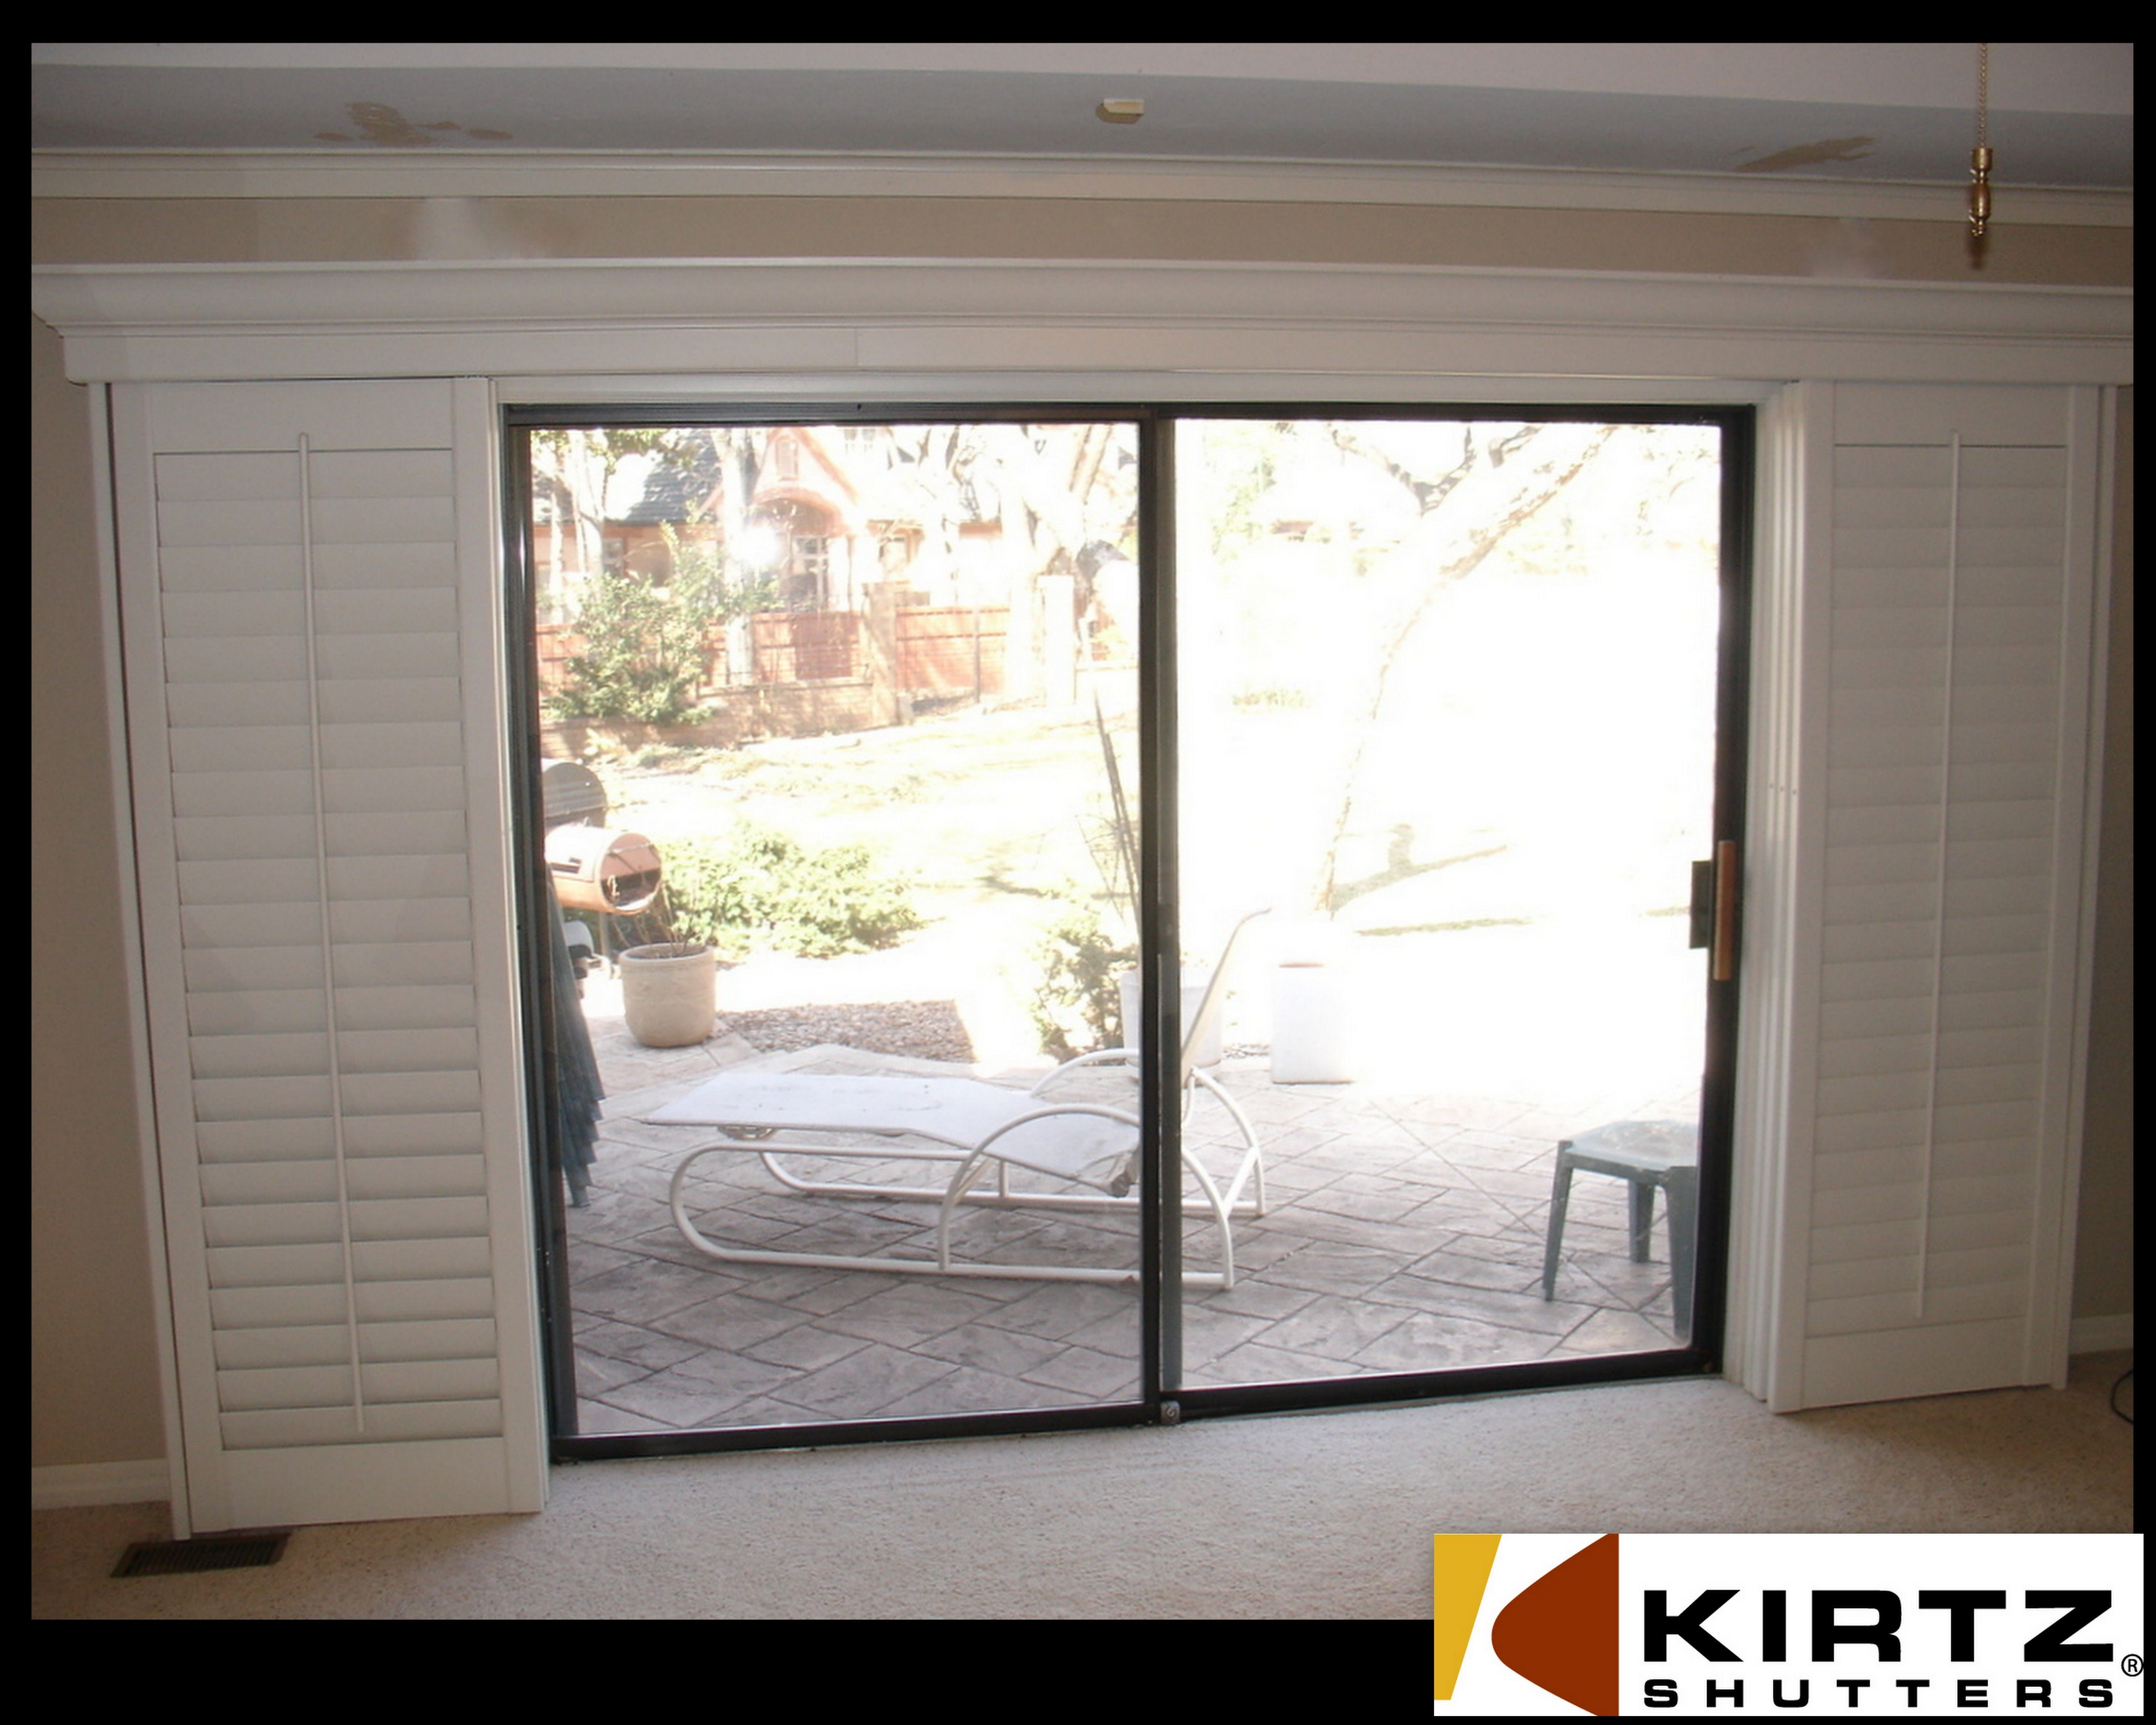 door french handballtunisie between with o glass l interior blinds astonishing org sliding patio inside doors